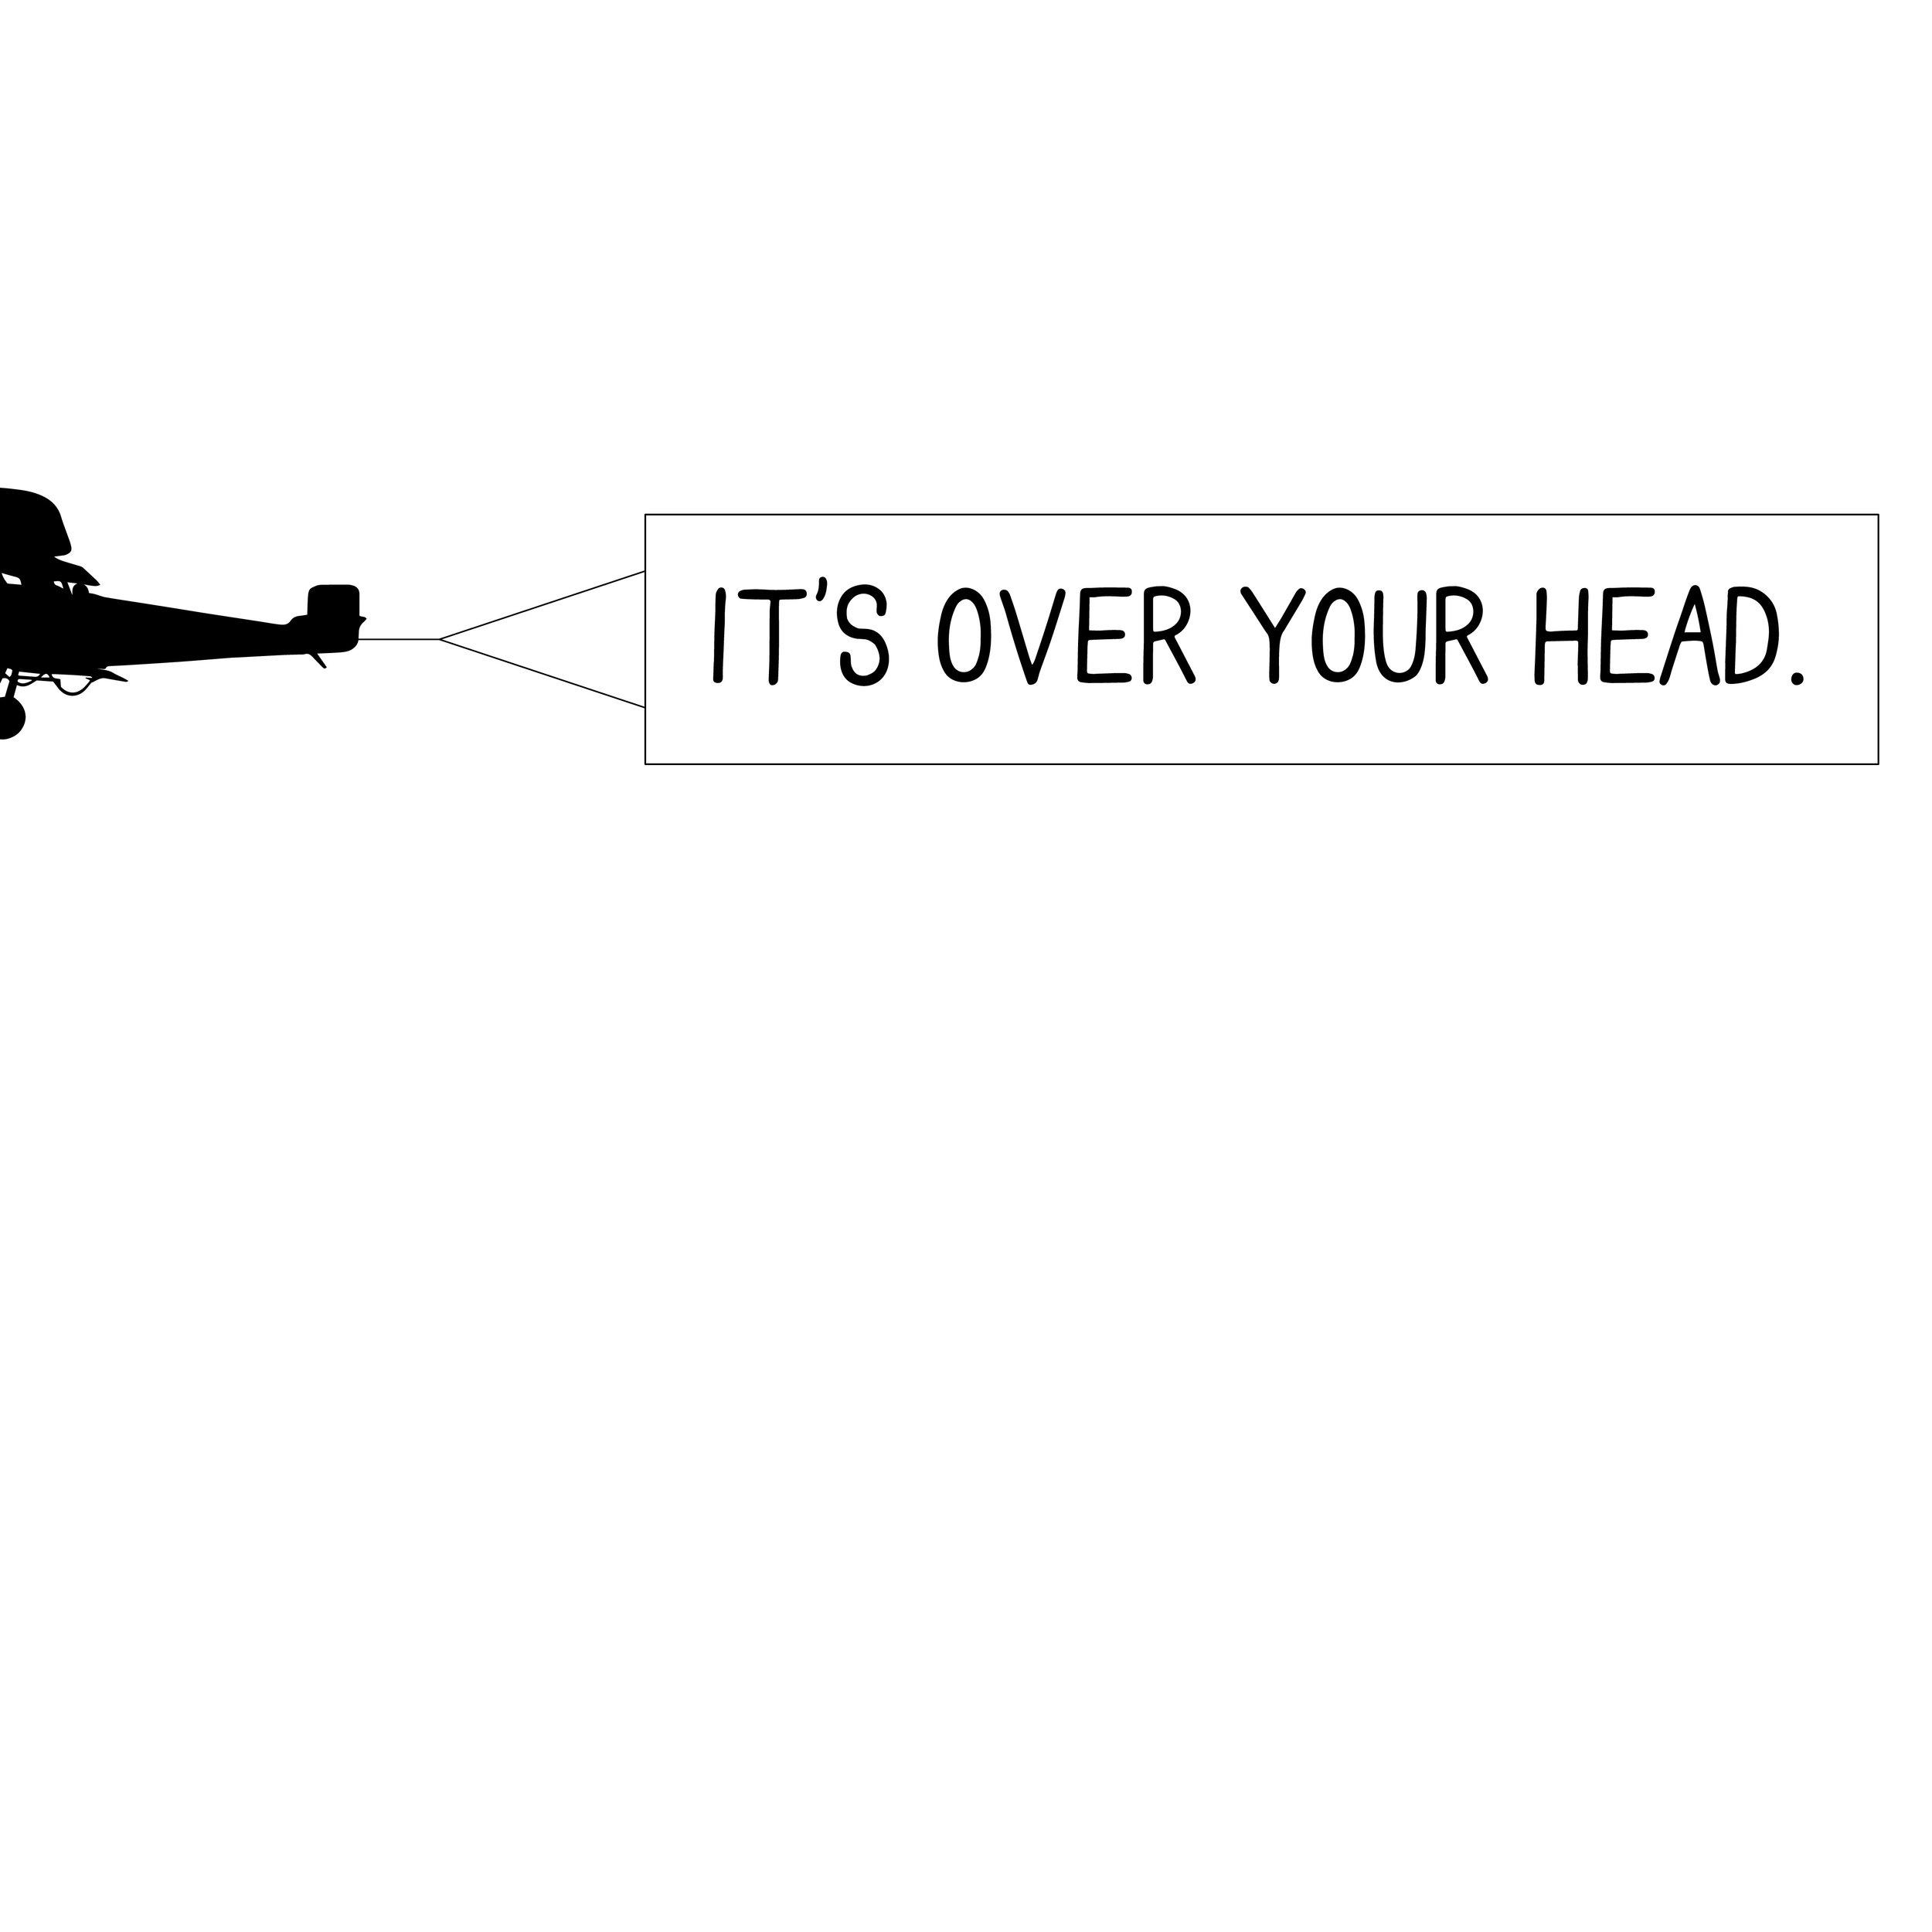 overyourhead-01.jpg